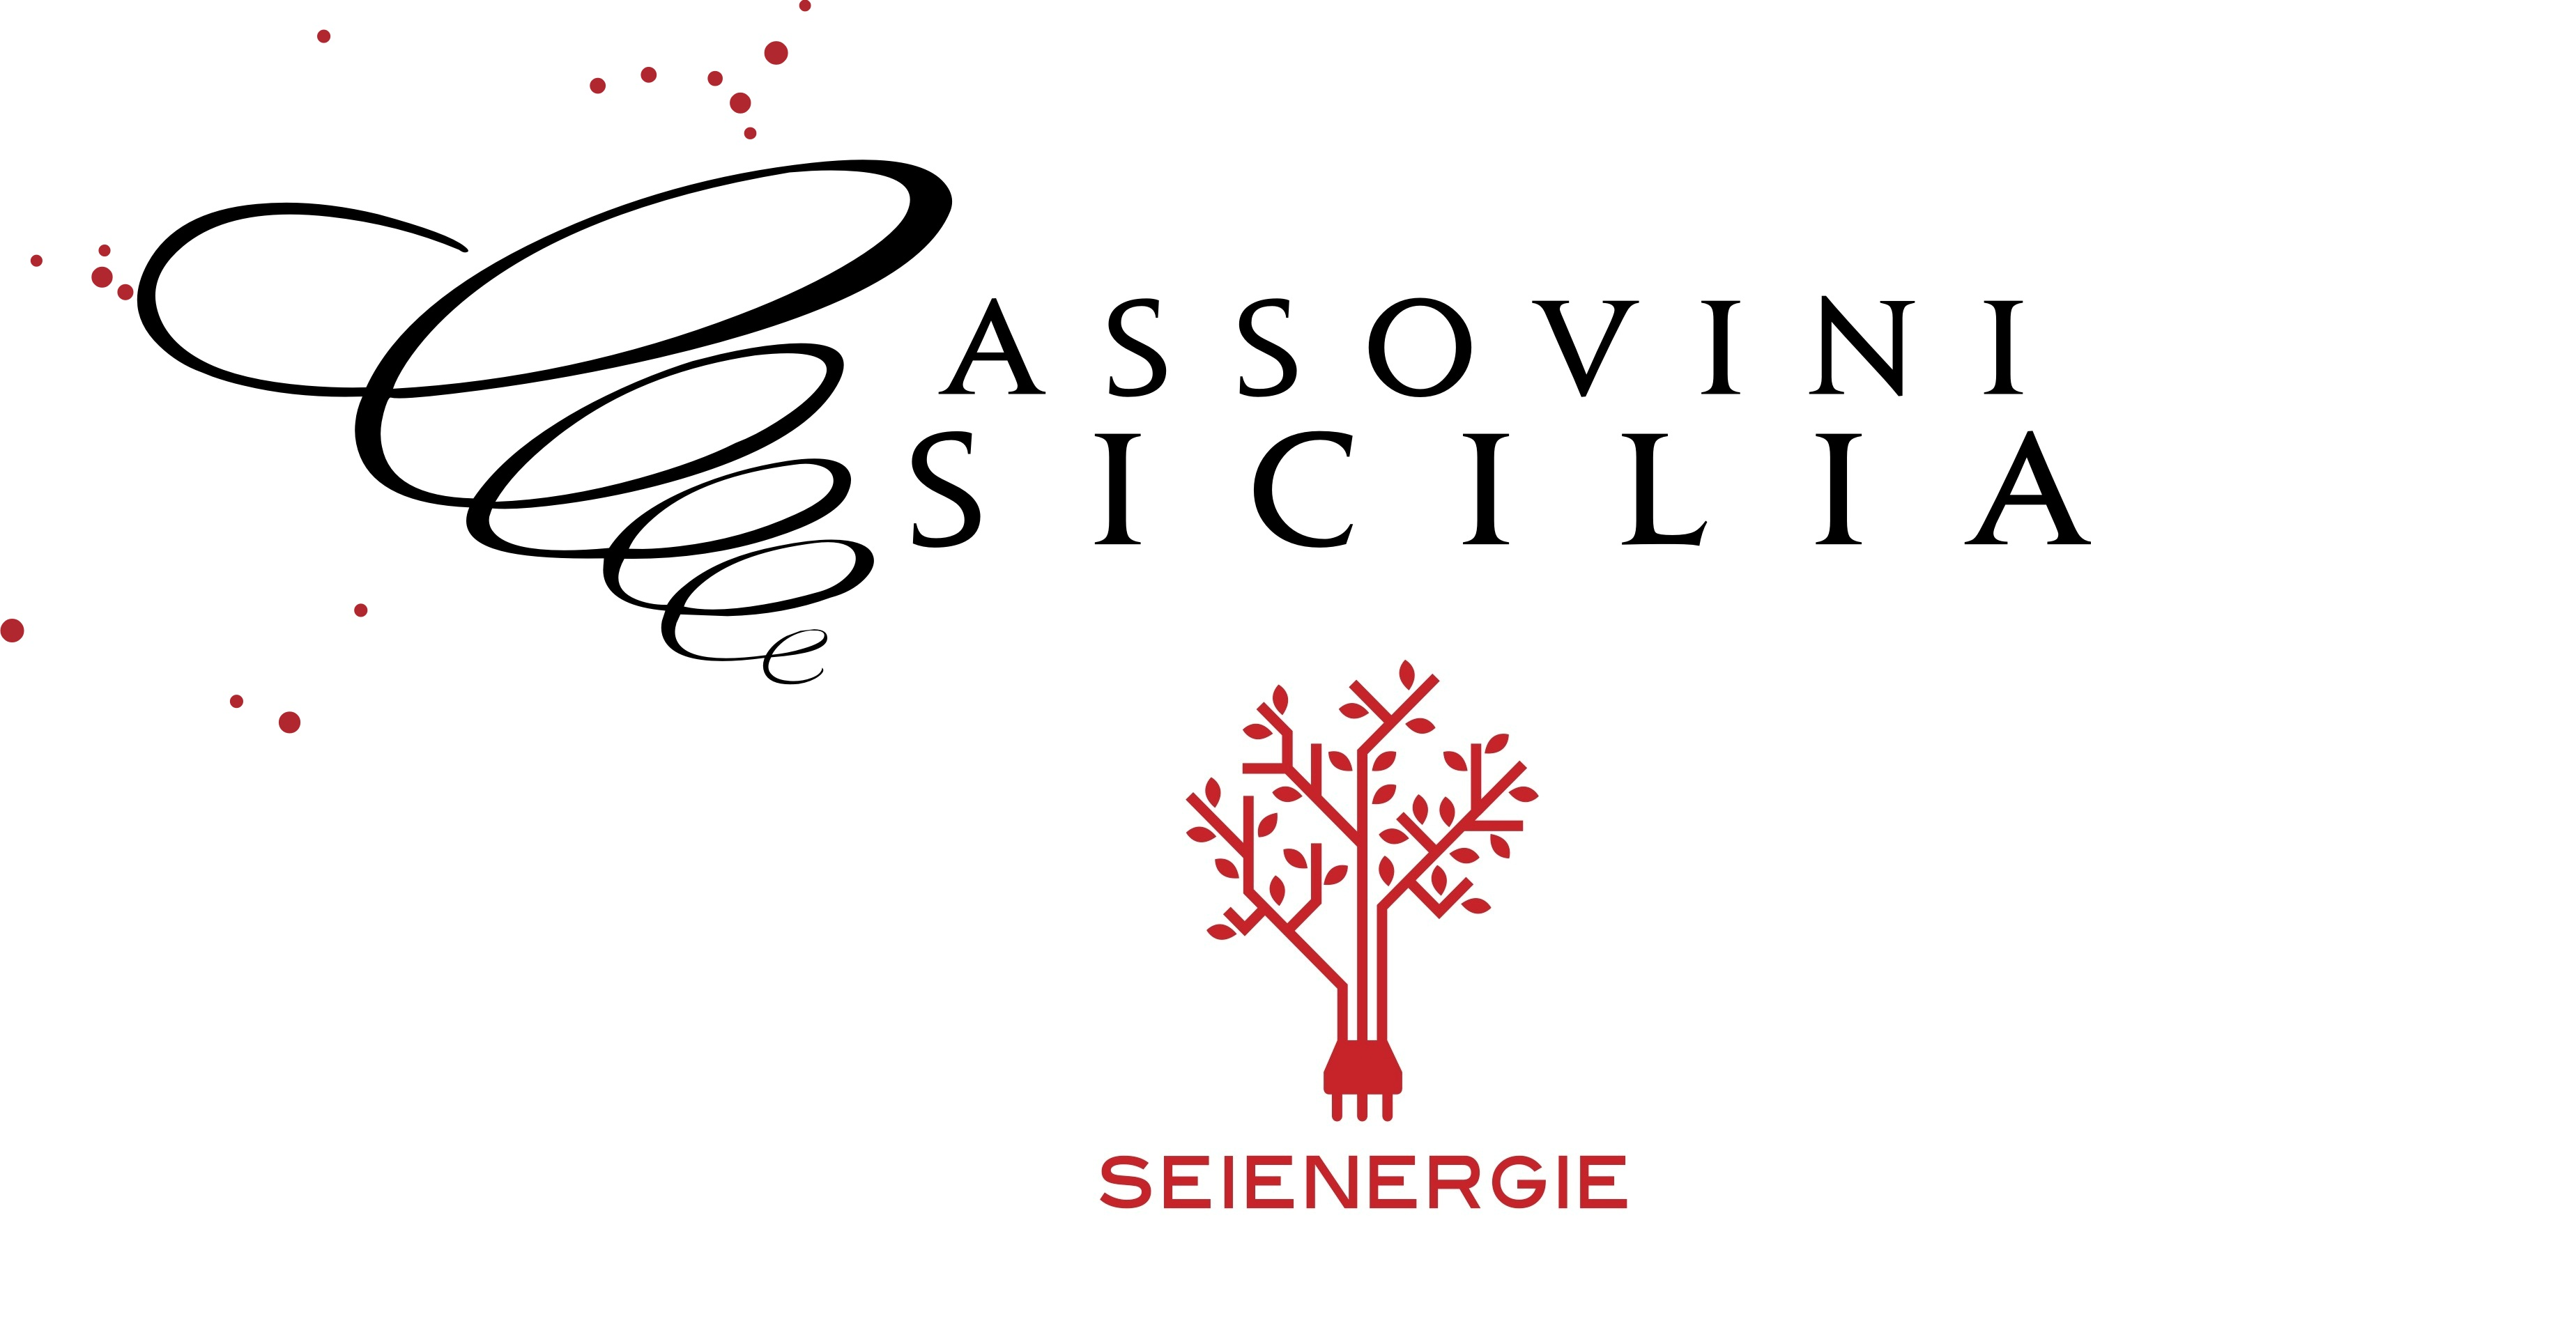 Seienergie + Assovini